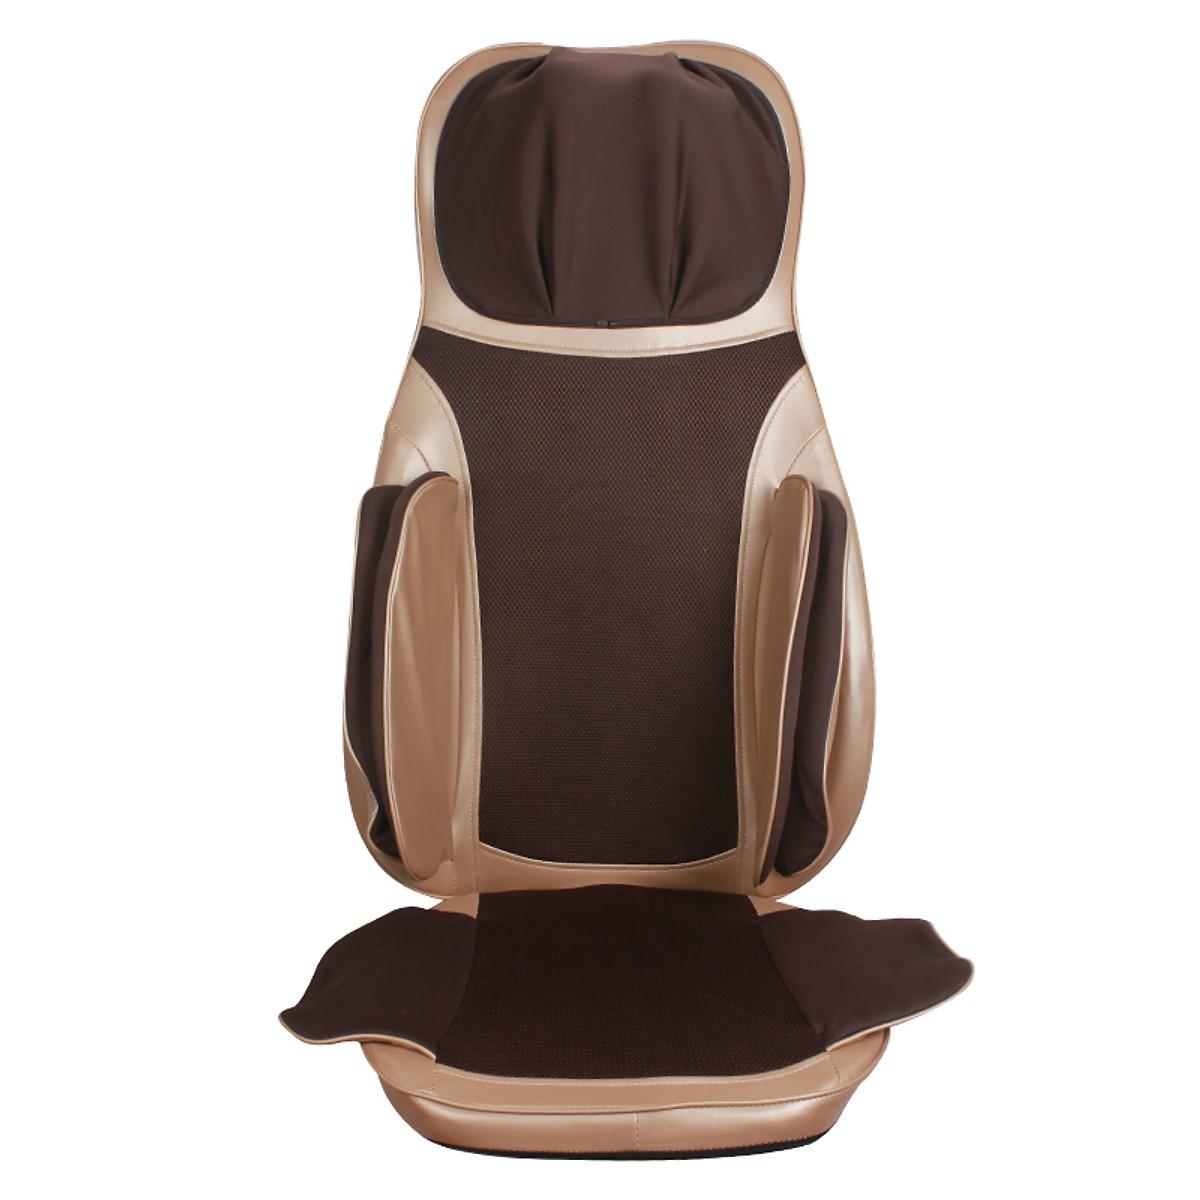 Đệm ghế massage Fuji Luxury MK115